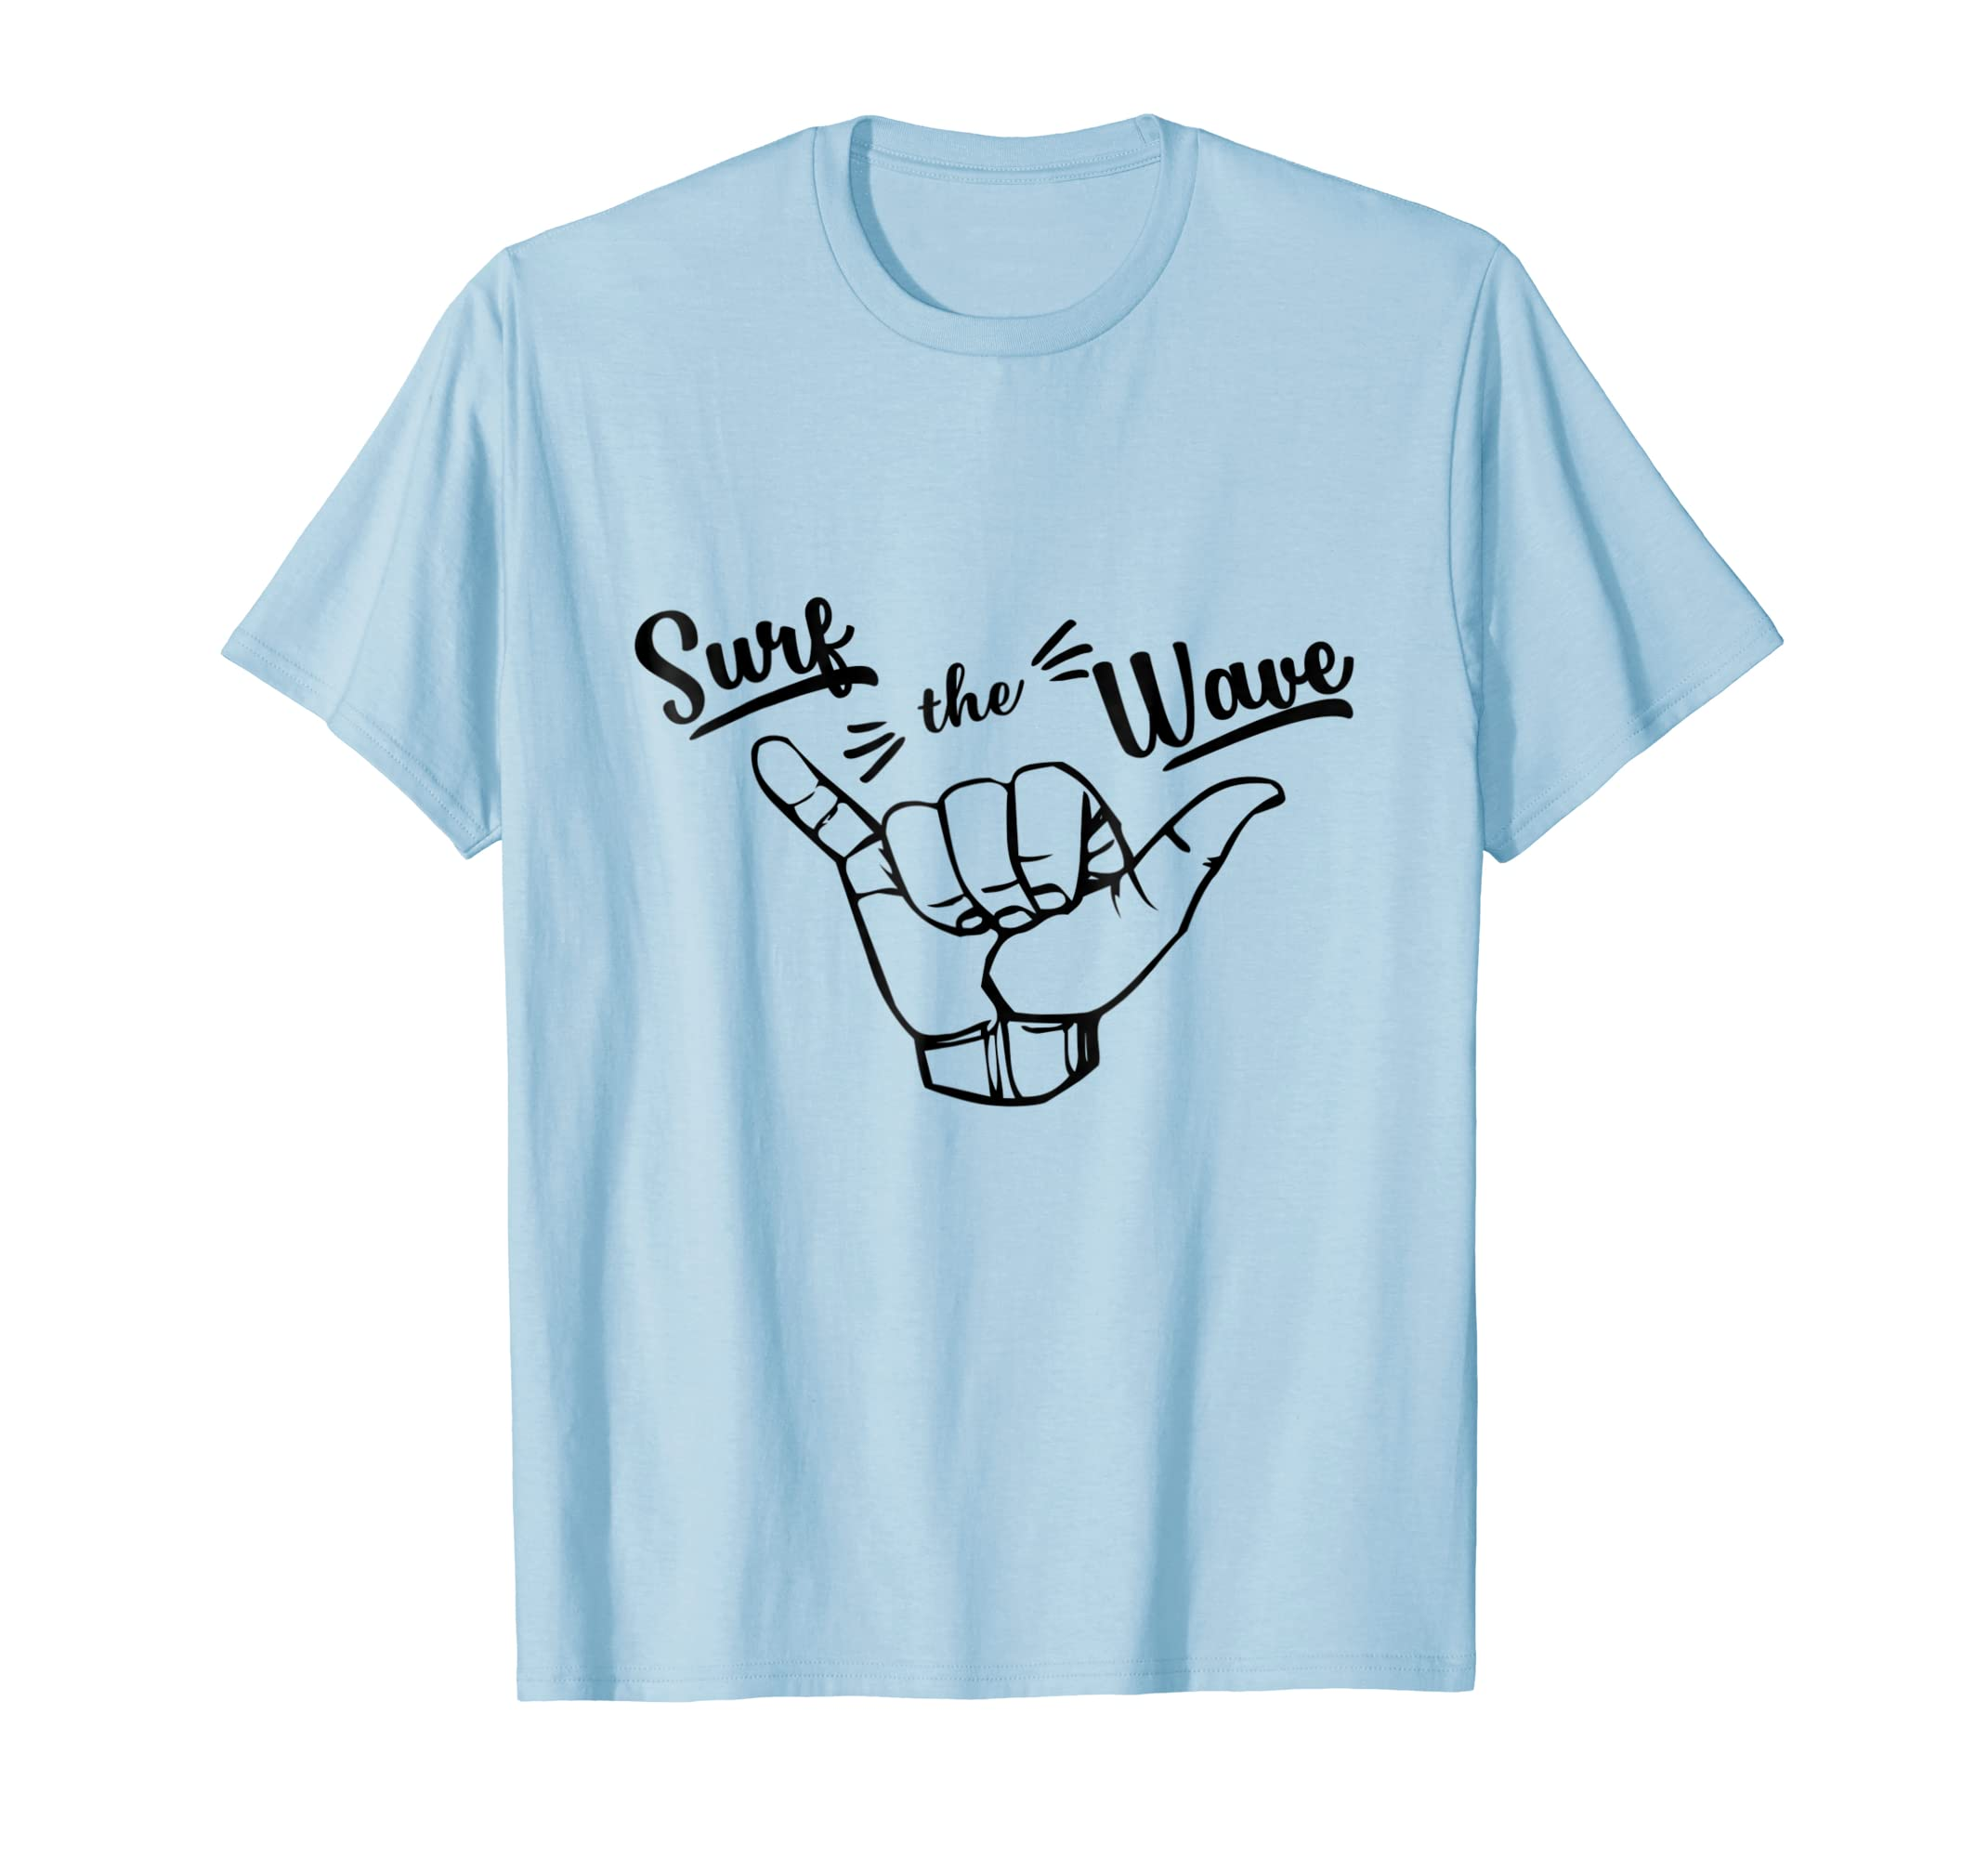 2d3ec2236b Amazon.com: Funny Surf the Wave Shirt Hawaii Shaka T-Shirt Surfer Gift:  Clothing